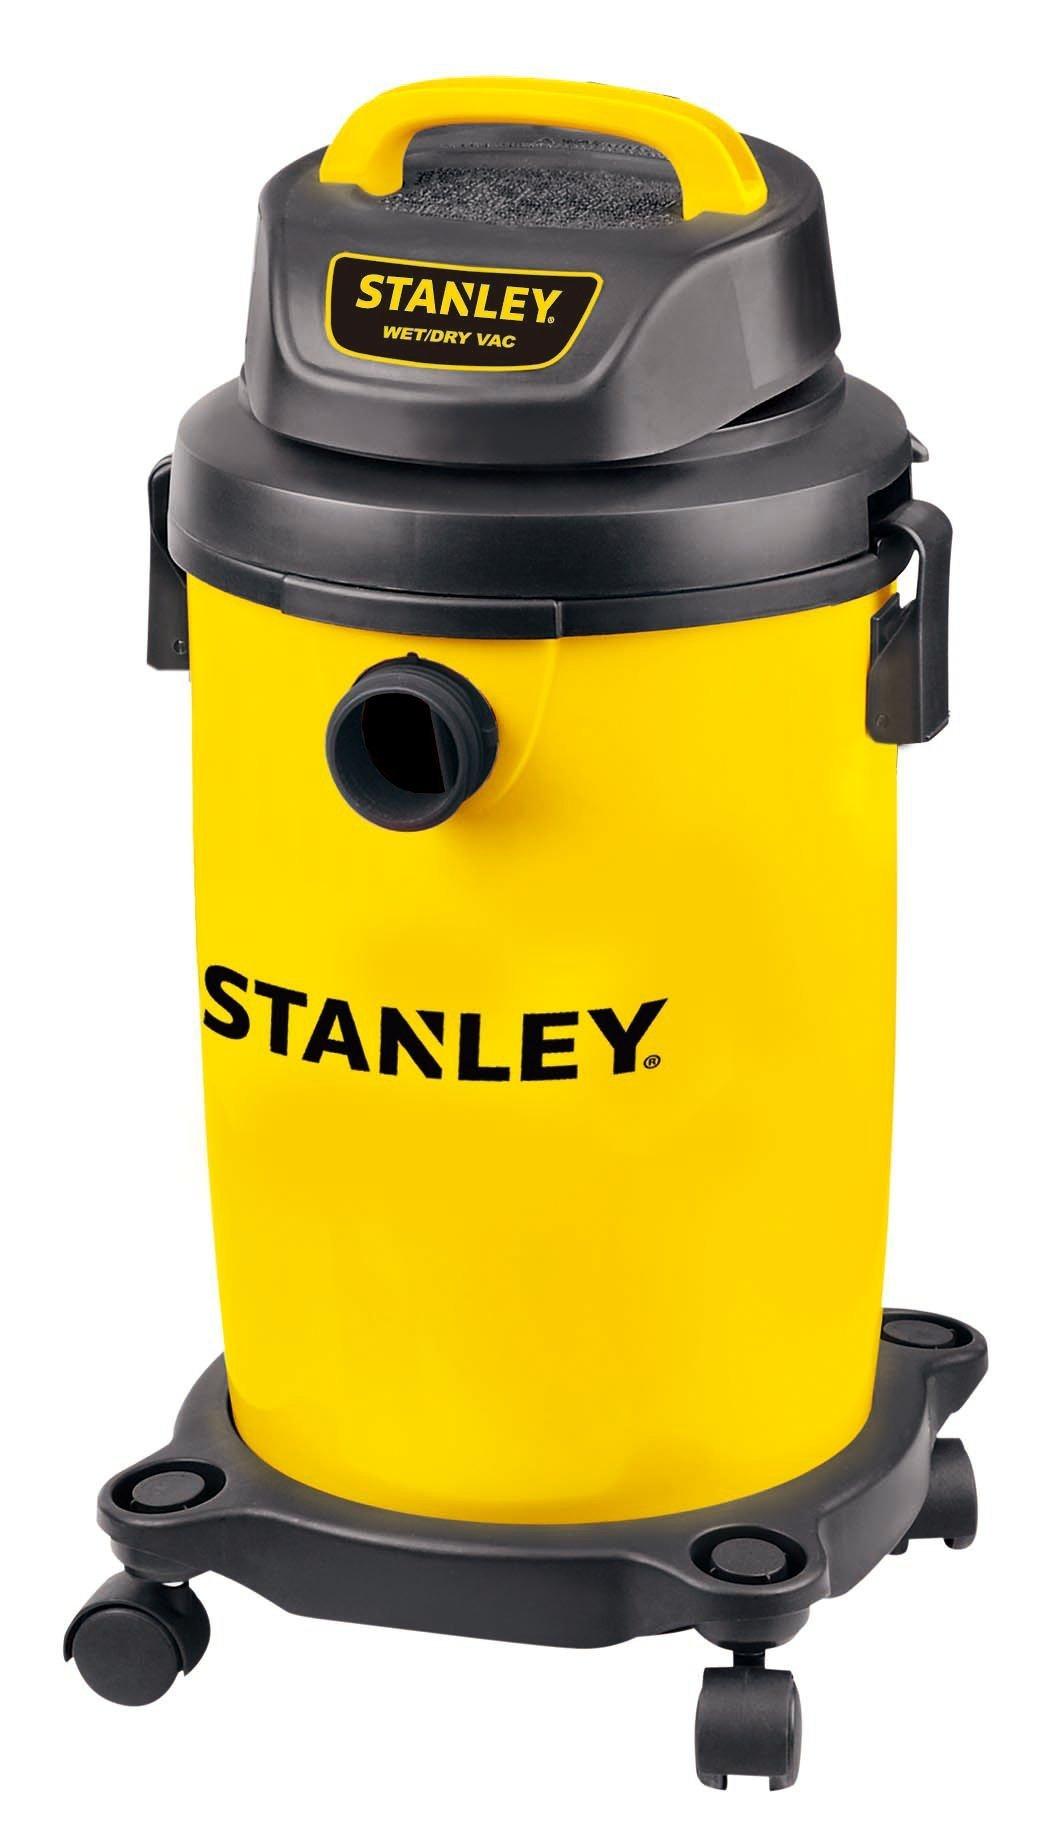 Stanley Wet/Dry Vacuum, 4.5 Gallon, 4 Horsepower (Renewed) by Stanley